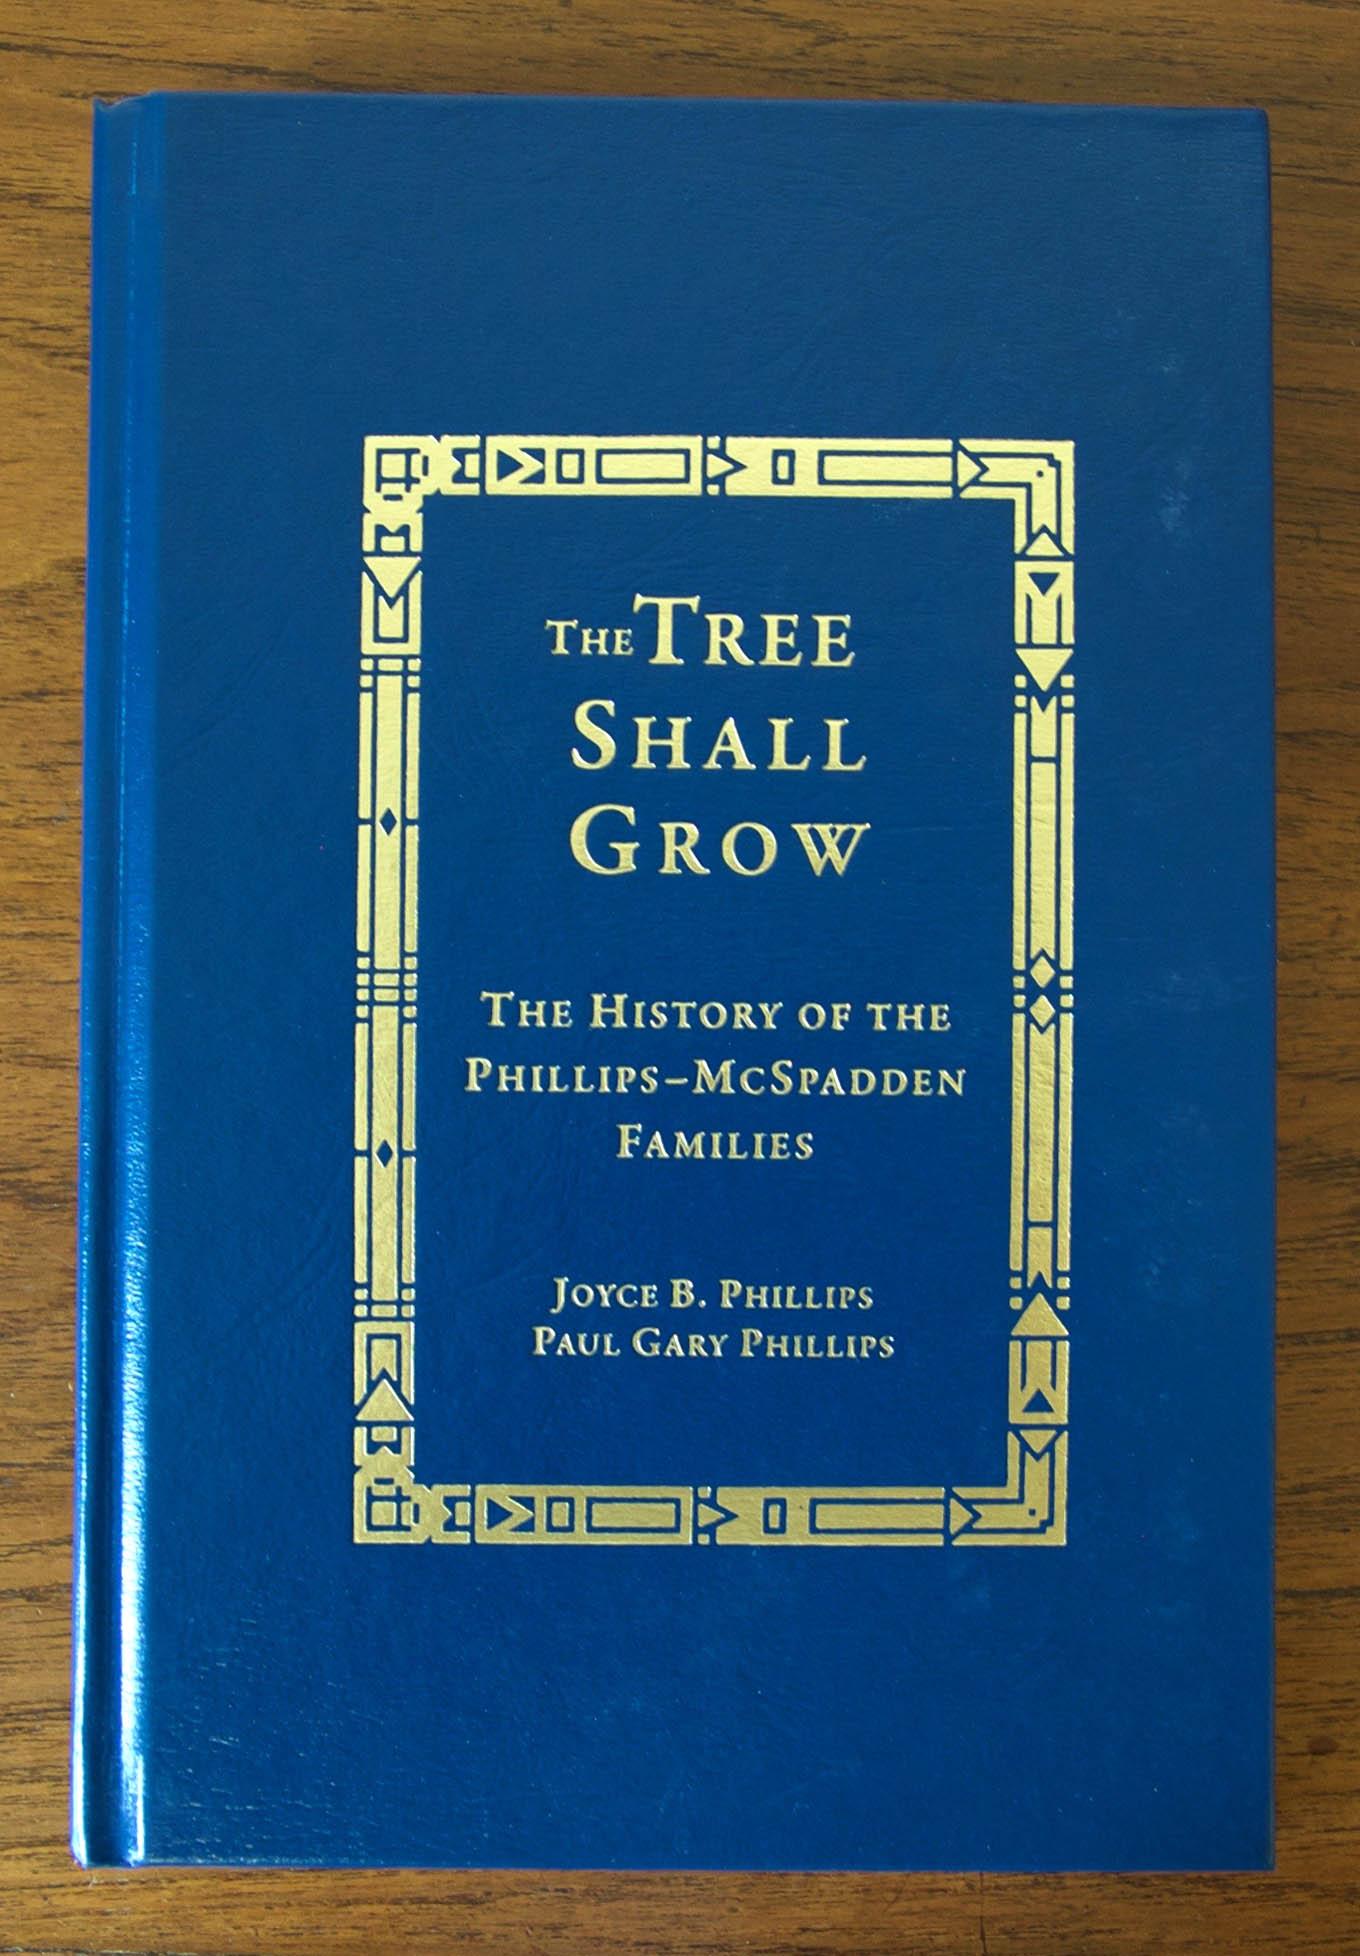 The Tree Shall Grow